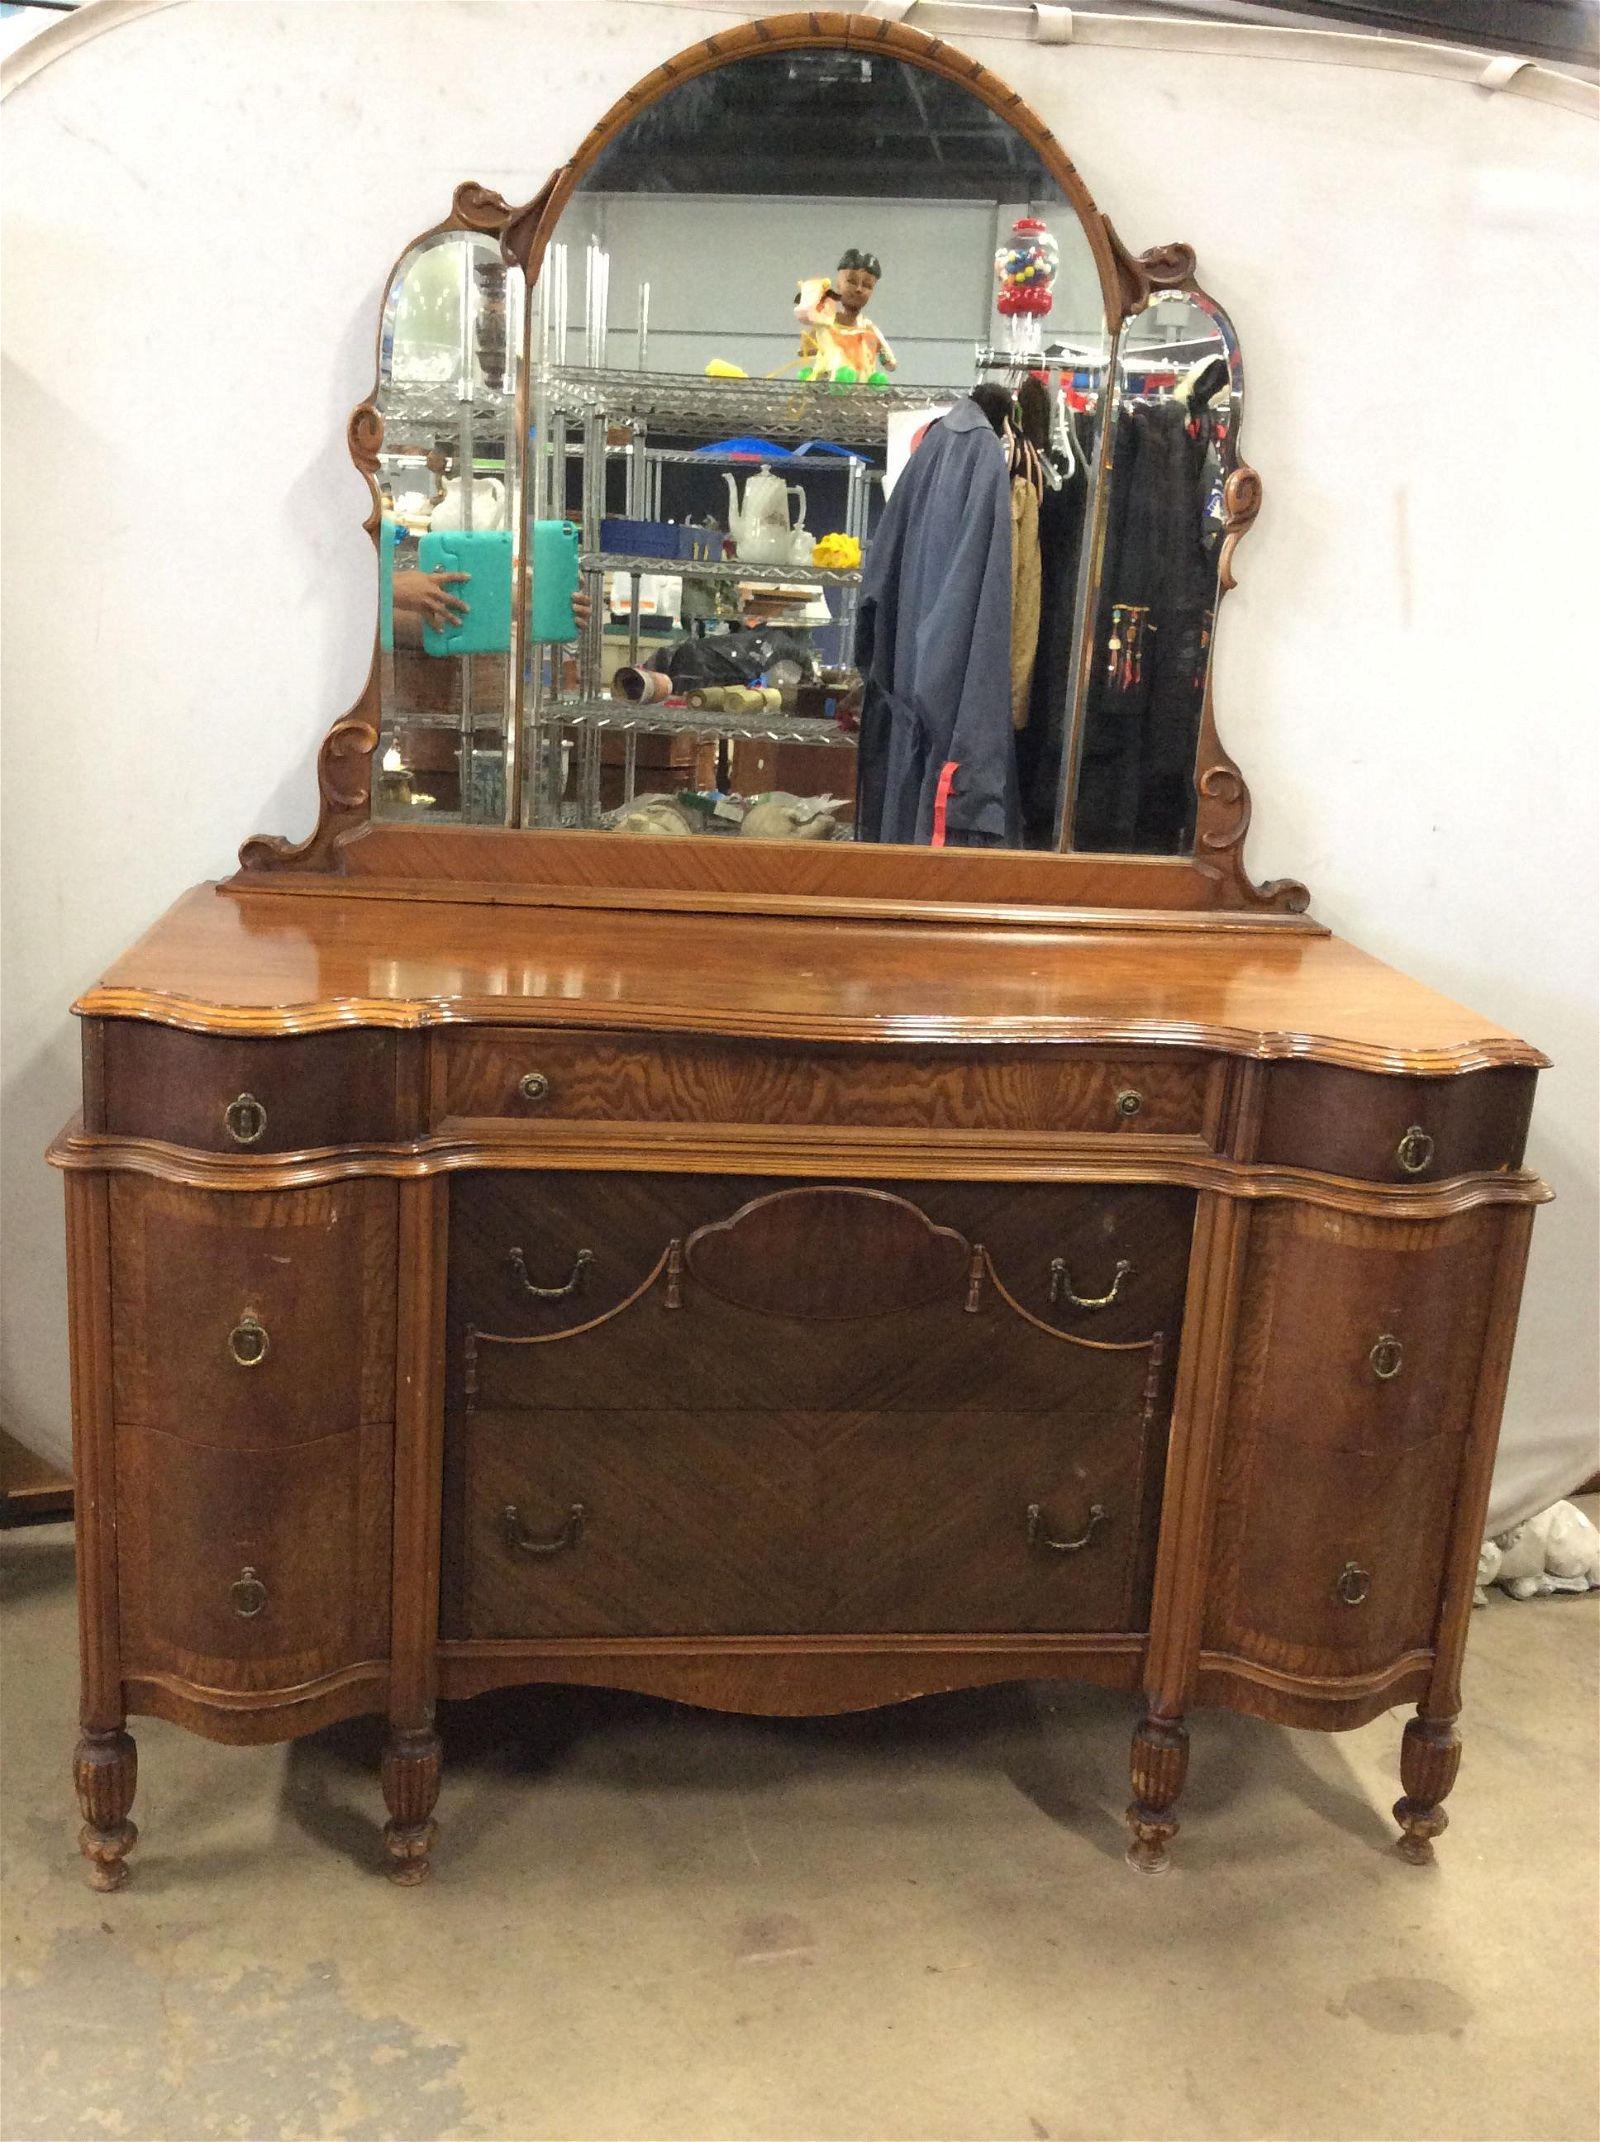 Antique Gettysburg Furniture Vanity Dresser Mar 18 2020 The Benefit Shop Foundation Inc In Ny